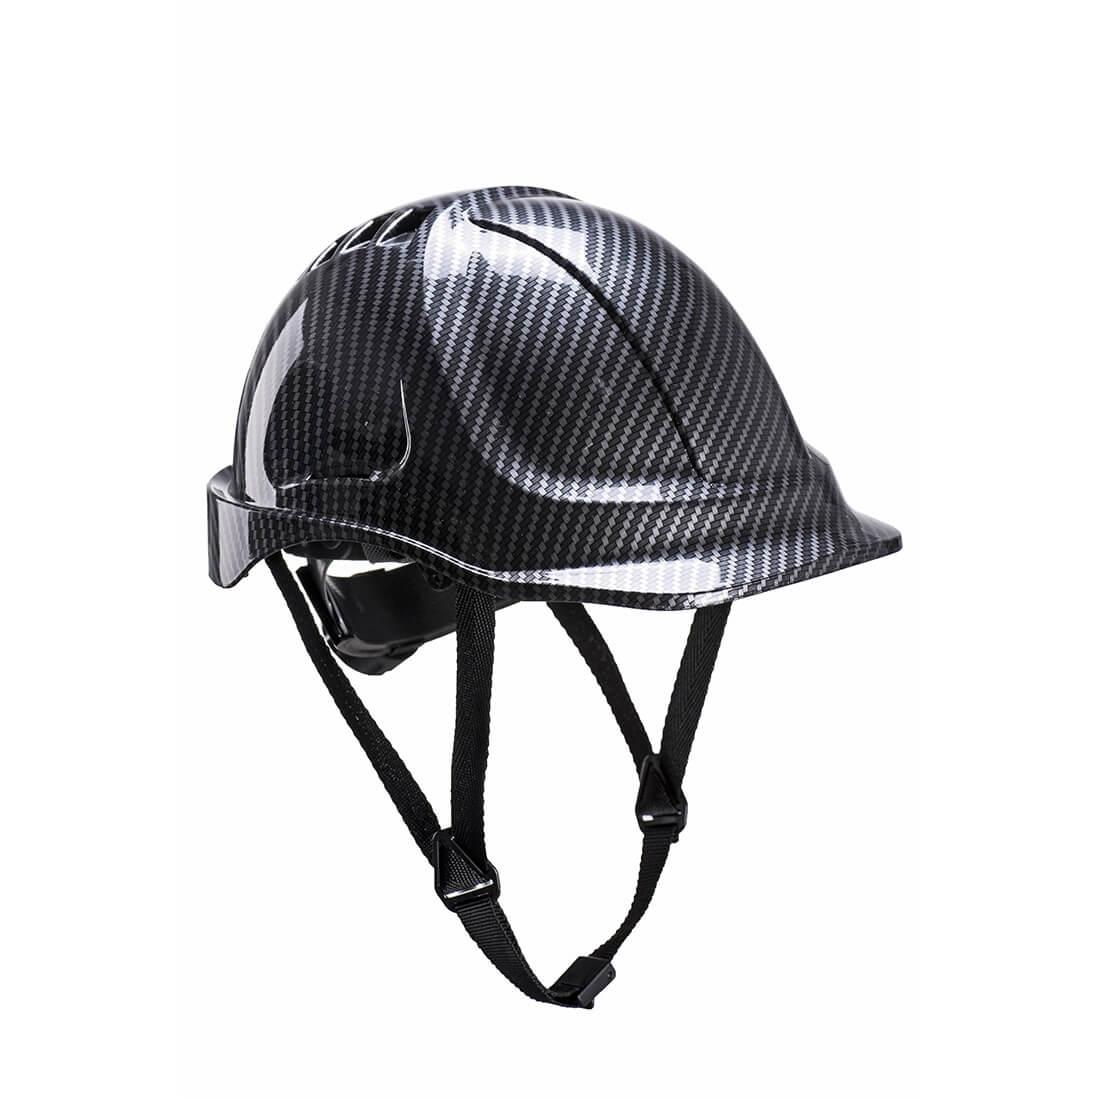 Casca Endurance Carbon Look - Echipamente de protectie personala